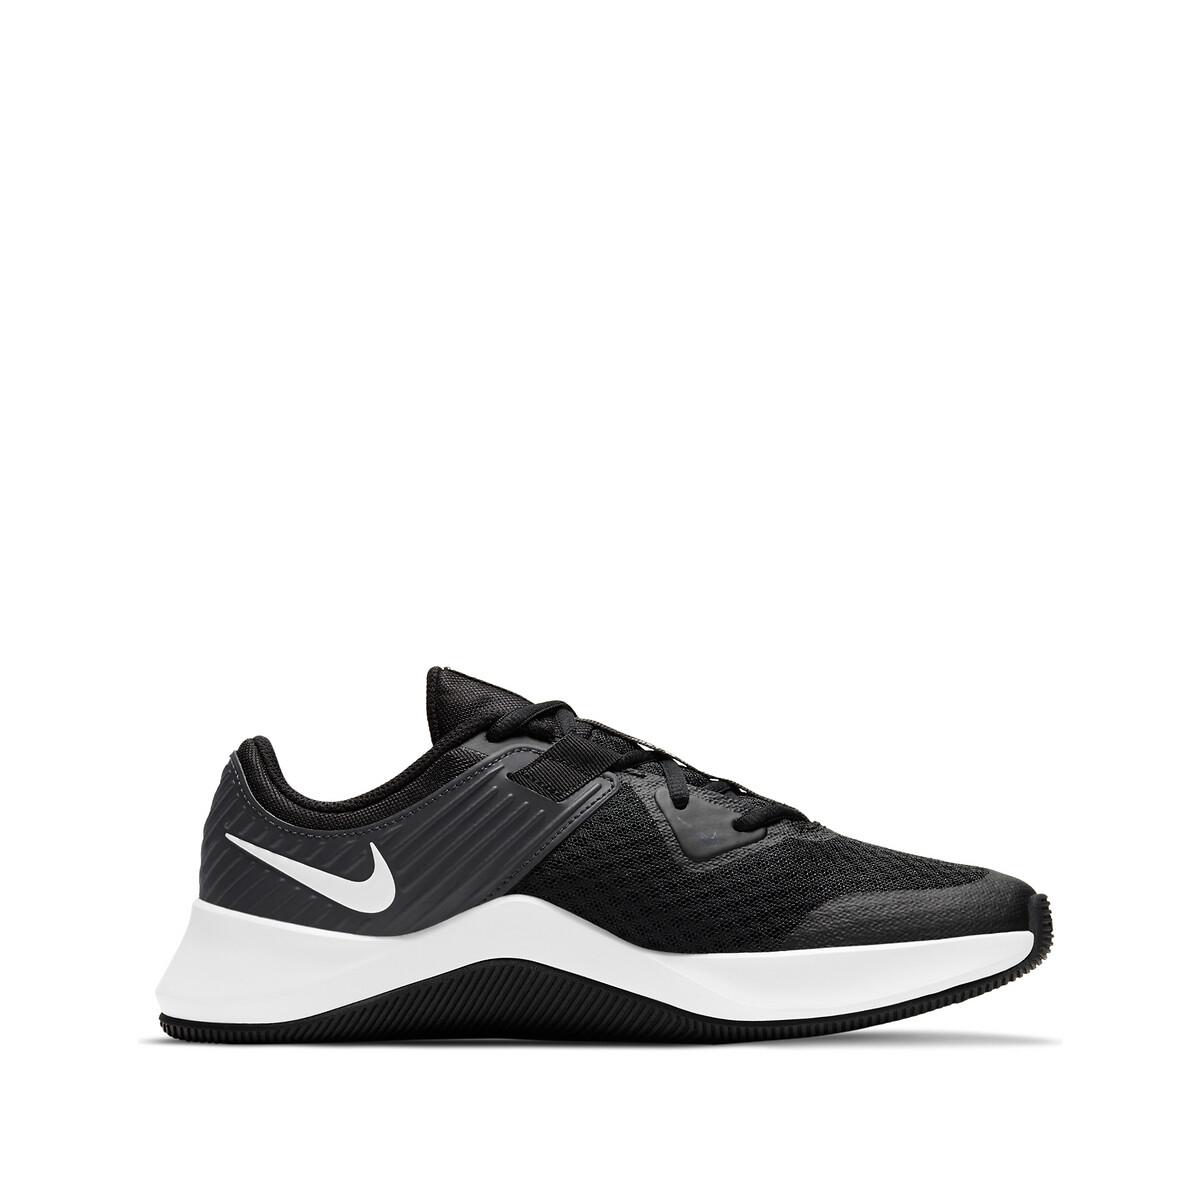 Nike MC Trainer Dames Black/Dark Smoke Grey/White Dames online kopen